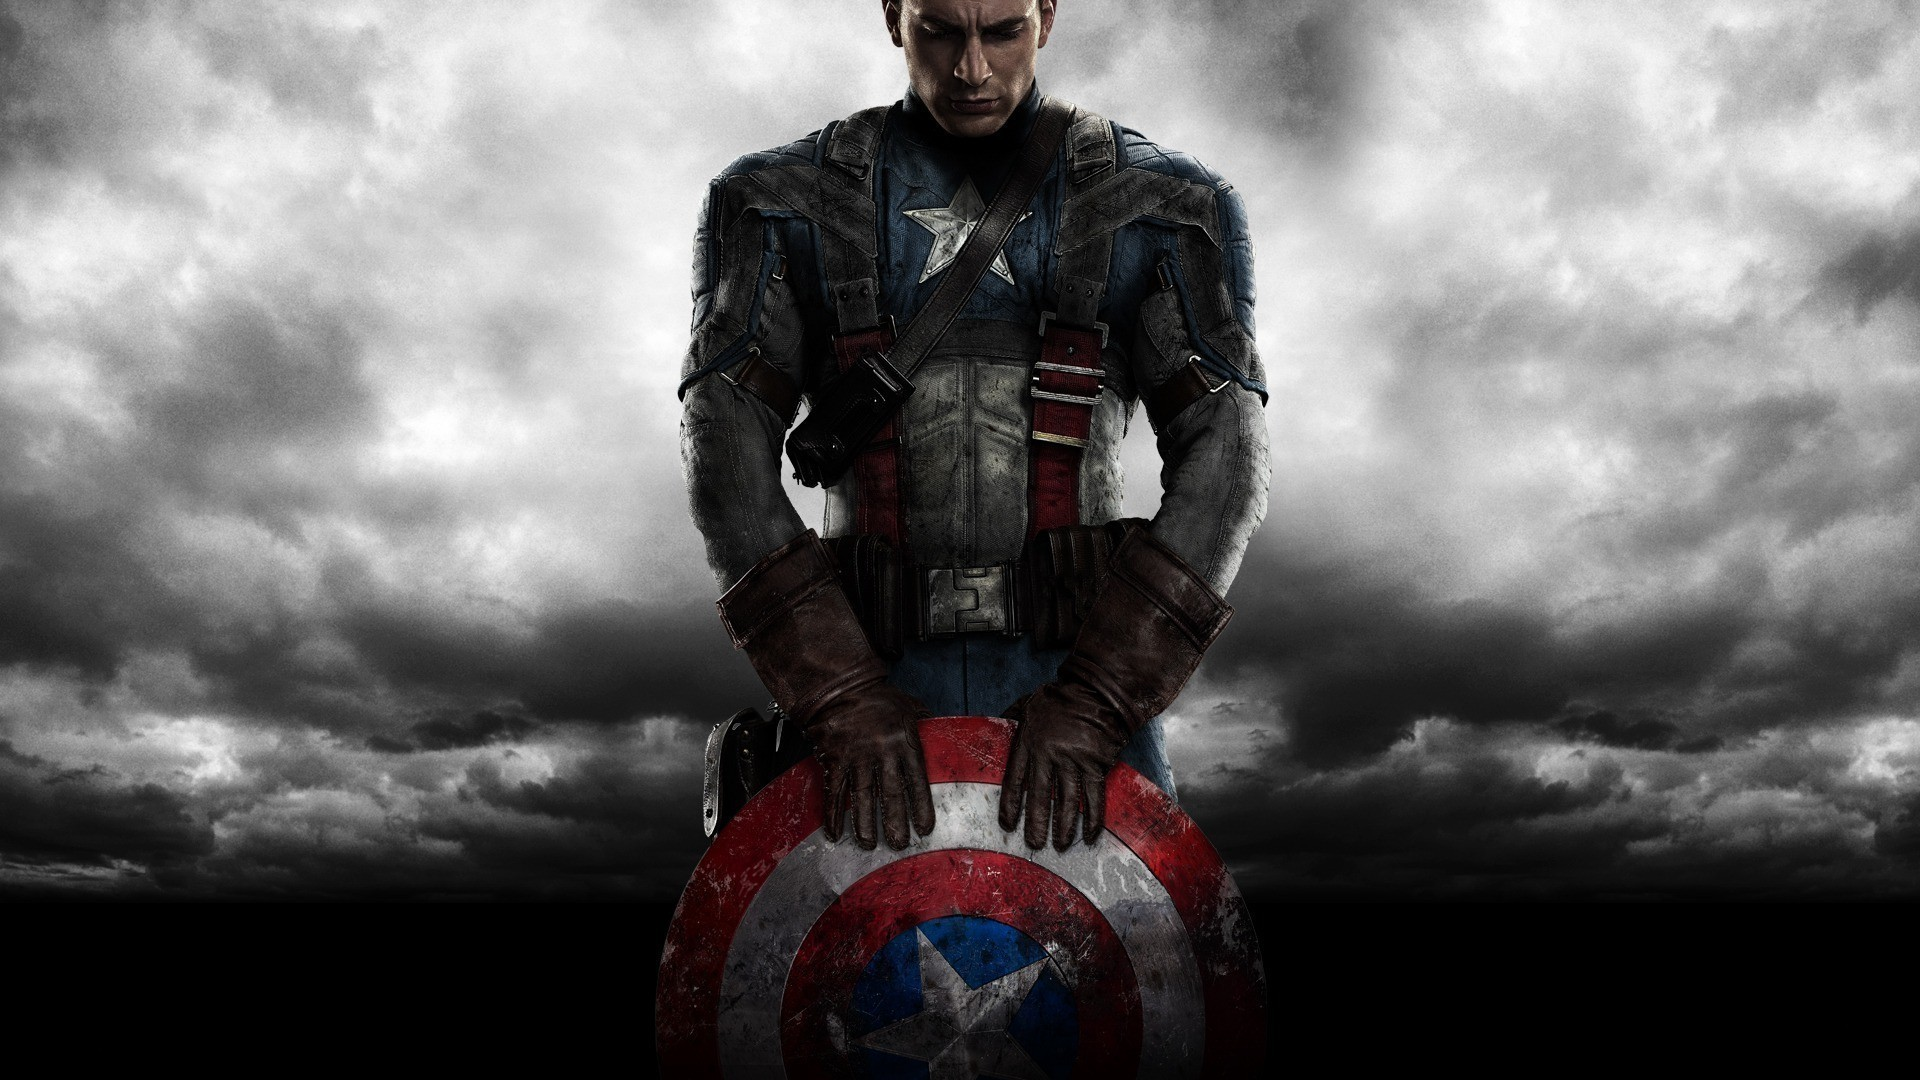 Captain America Winter Soldier Wallpaper 1920x1080 4 1920x1080